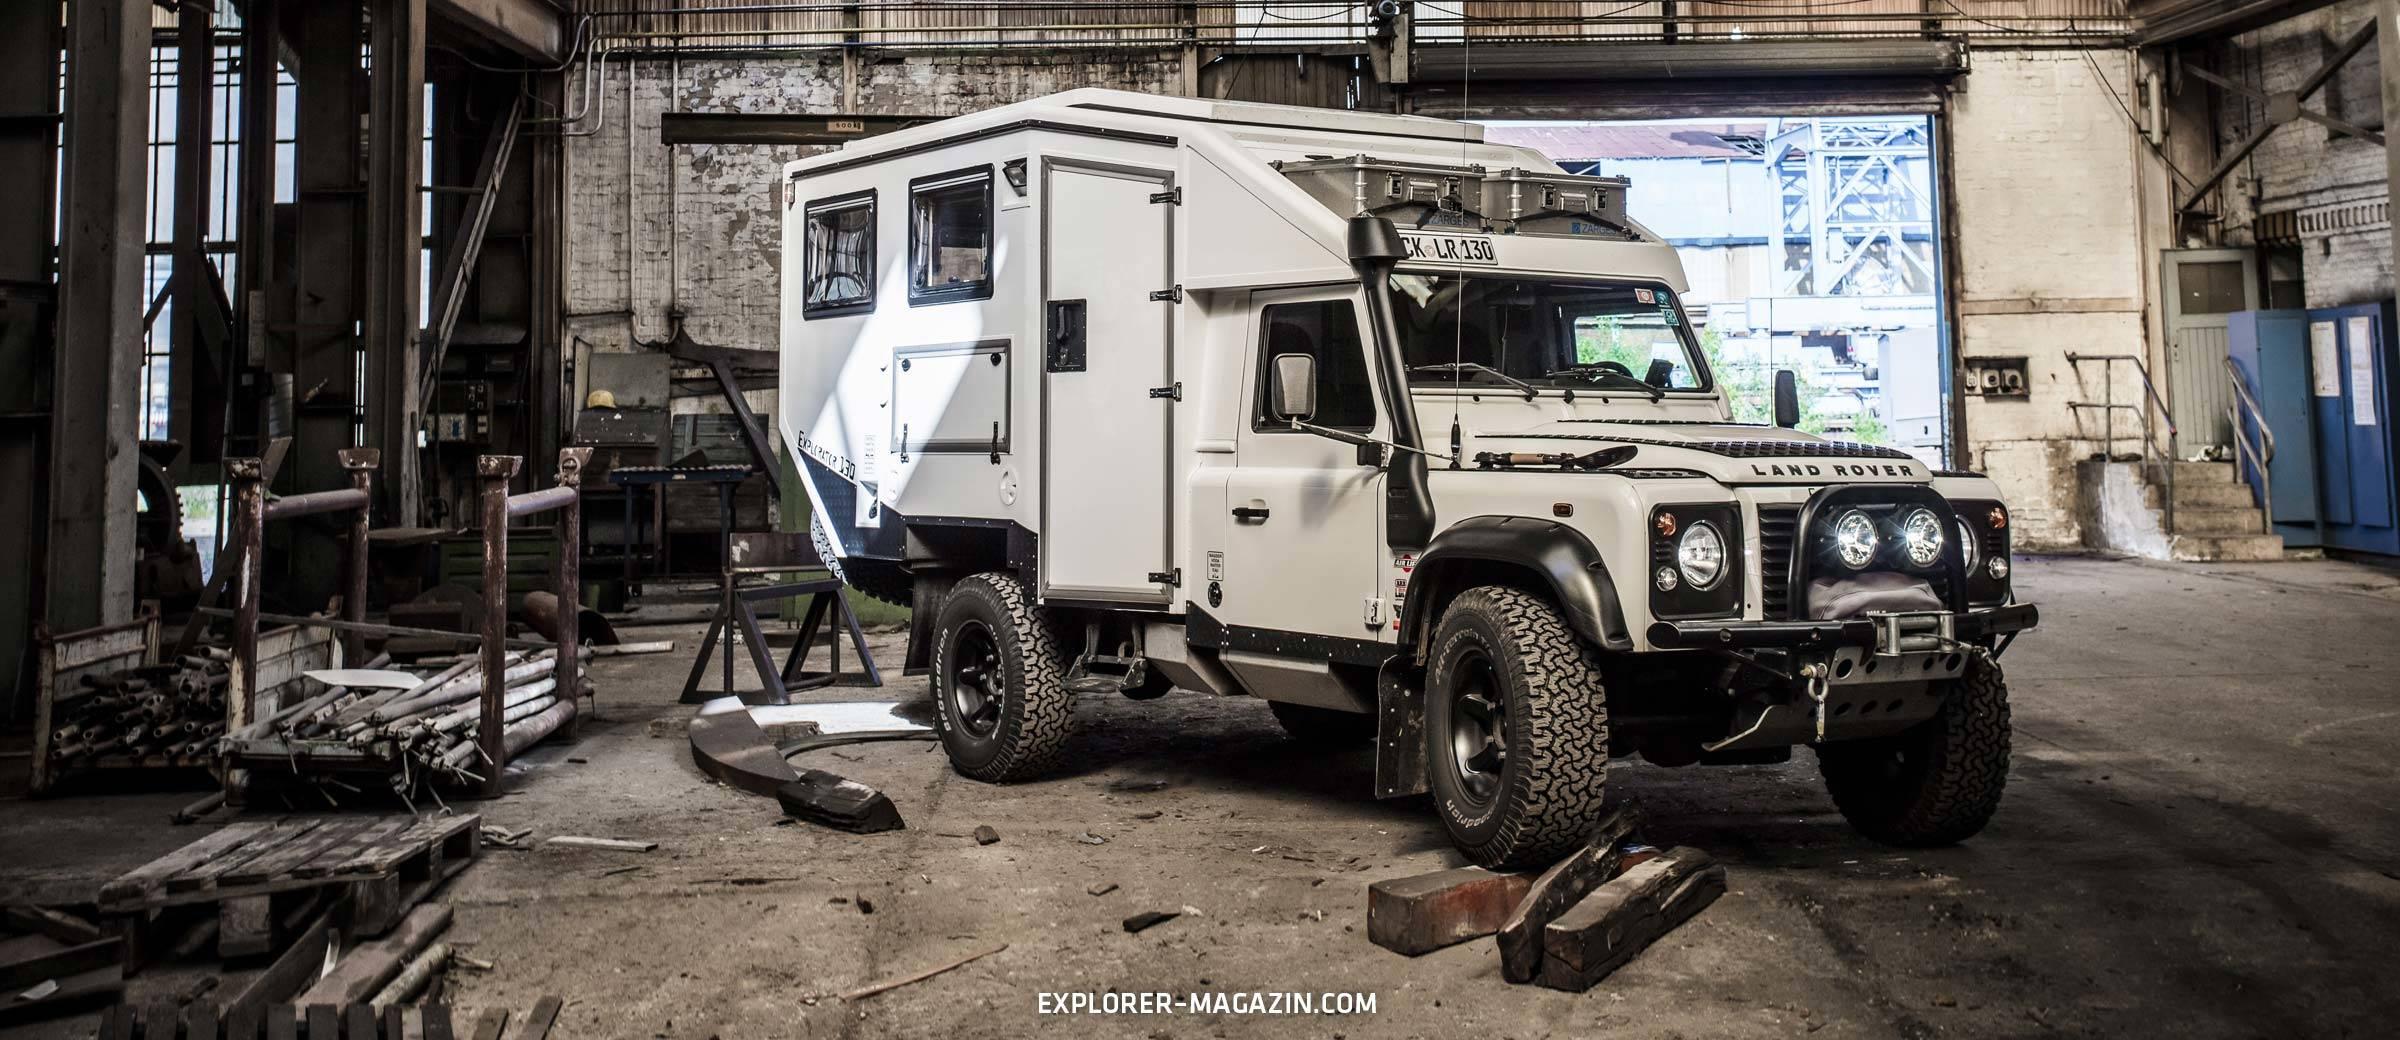 Land Rover Defender 130 Singlecab - Explorator Expeditionsfahrzeug